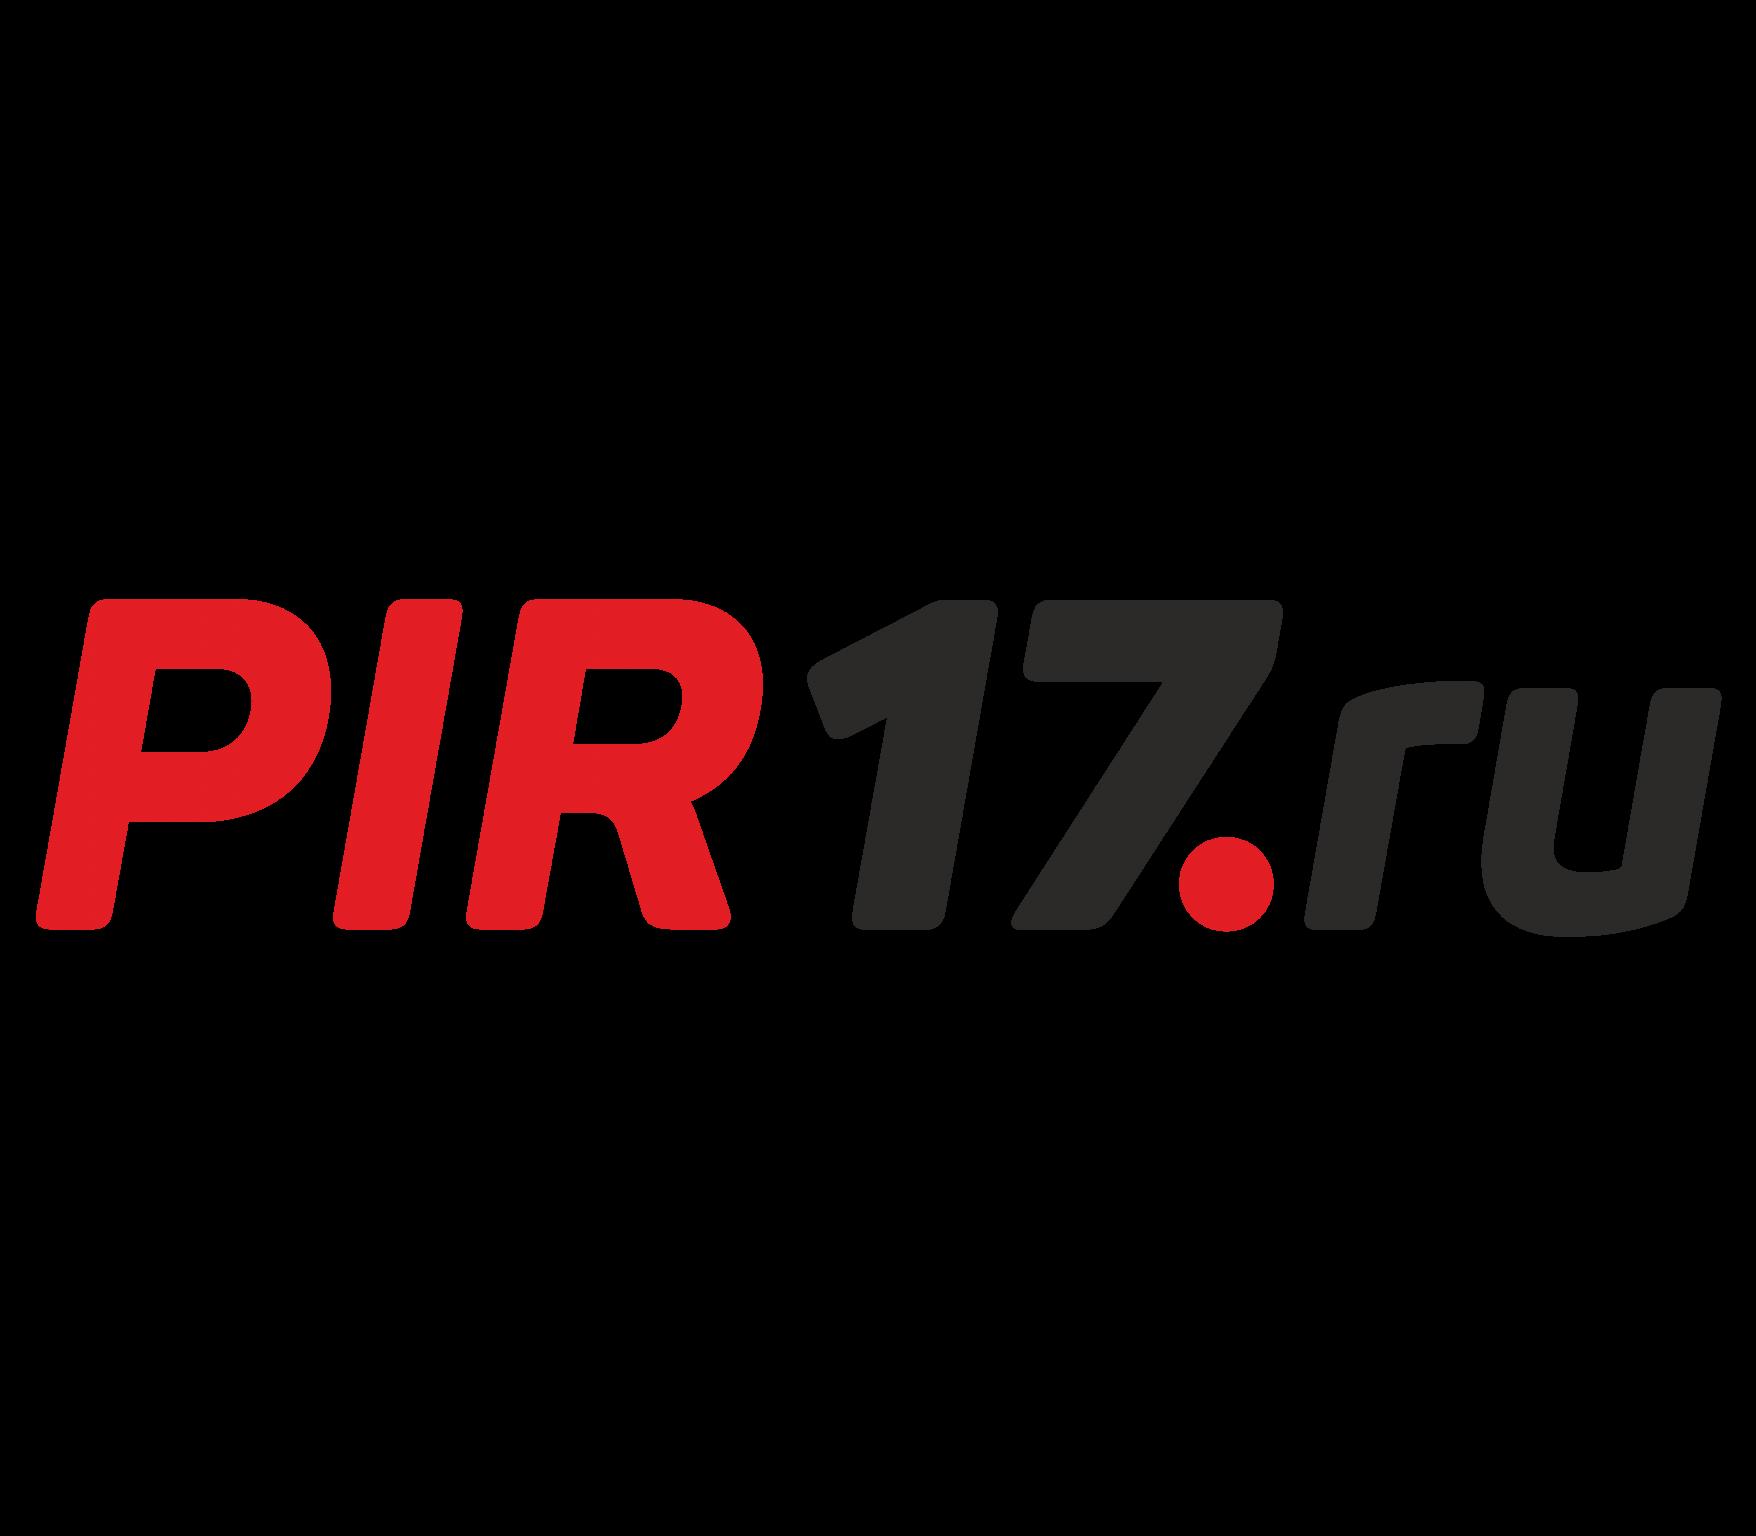 PIR17.RU